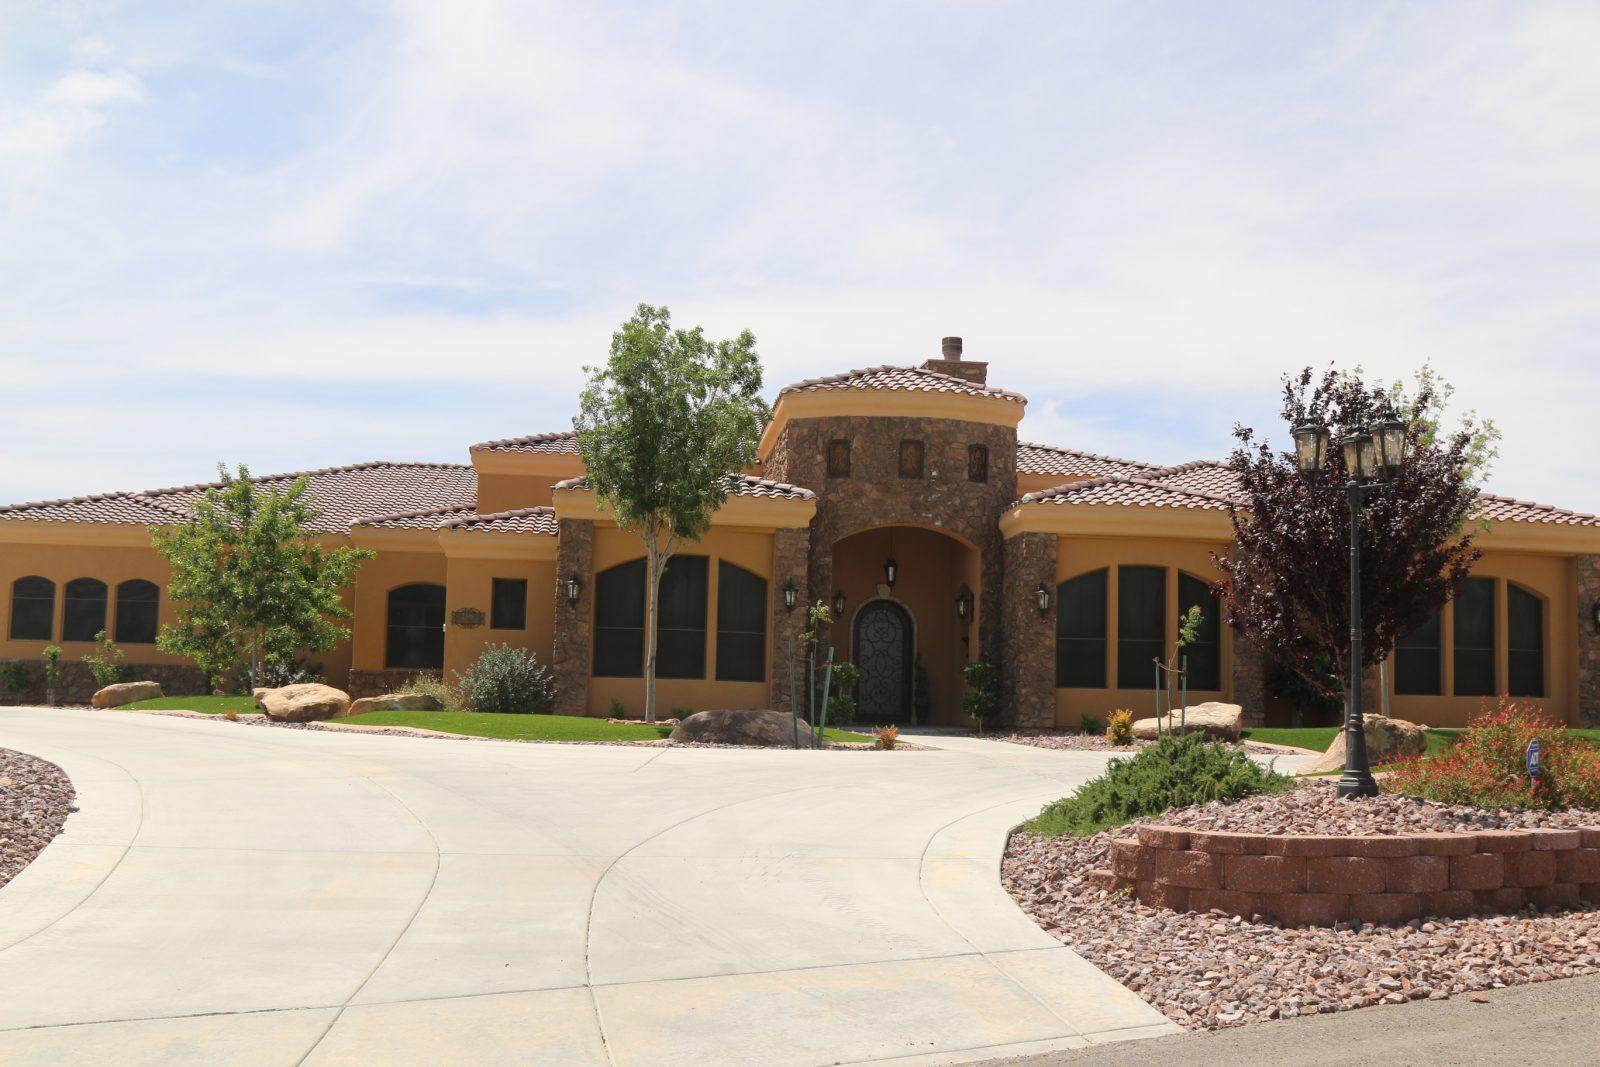 Homes For Sale In Kingman AZ  Dale Lucas GRI